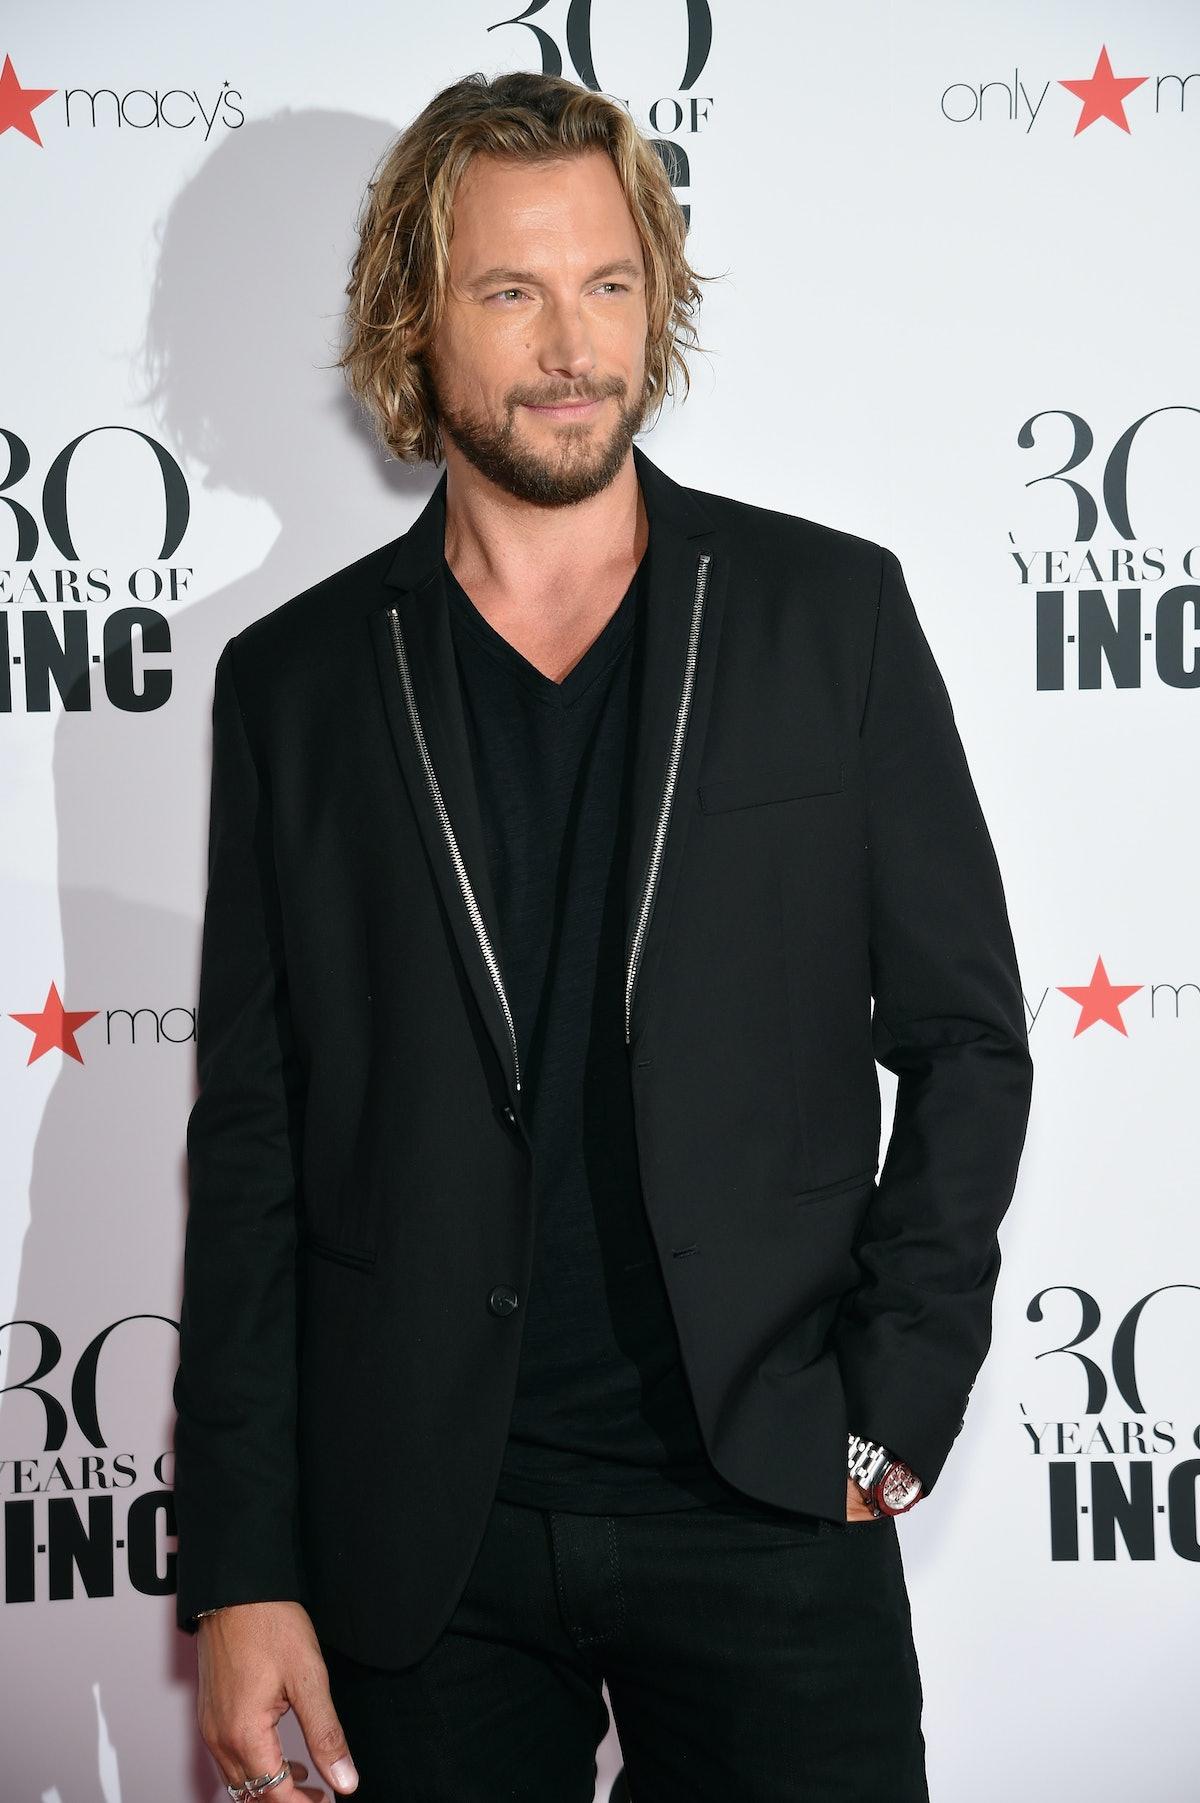 Gabriel Aubry attends Heidi Klum + Gabriel Aubry's celebration of the launch of INC's 30th Anniversary Collection